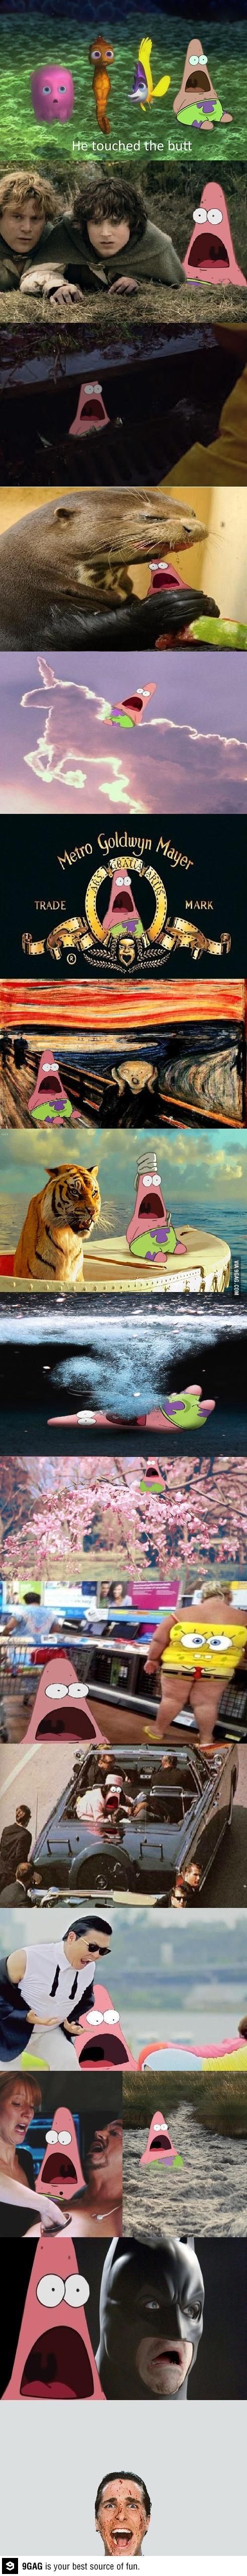 Surprised Patrick!!